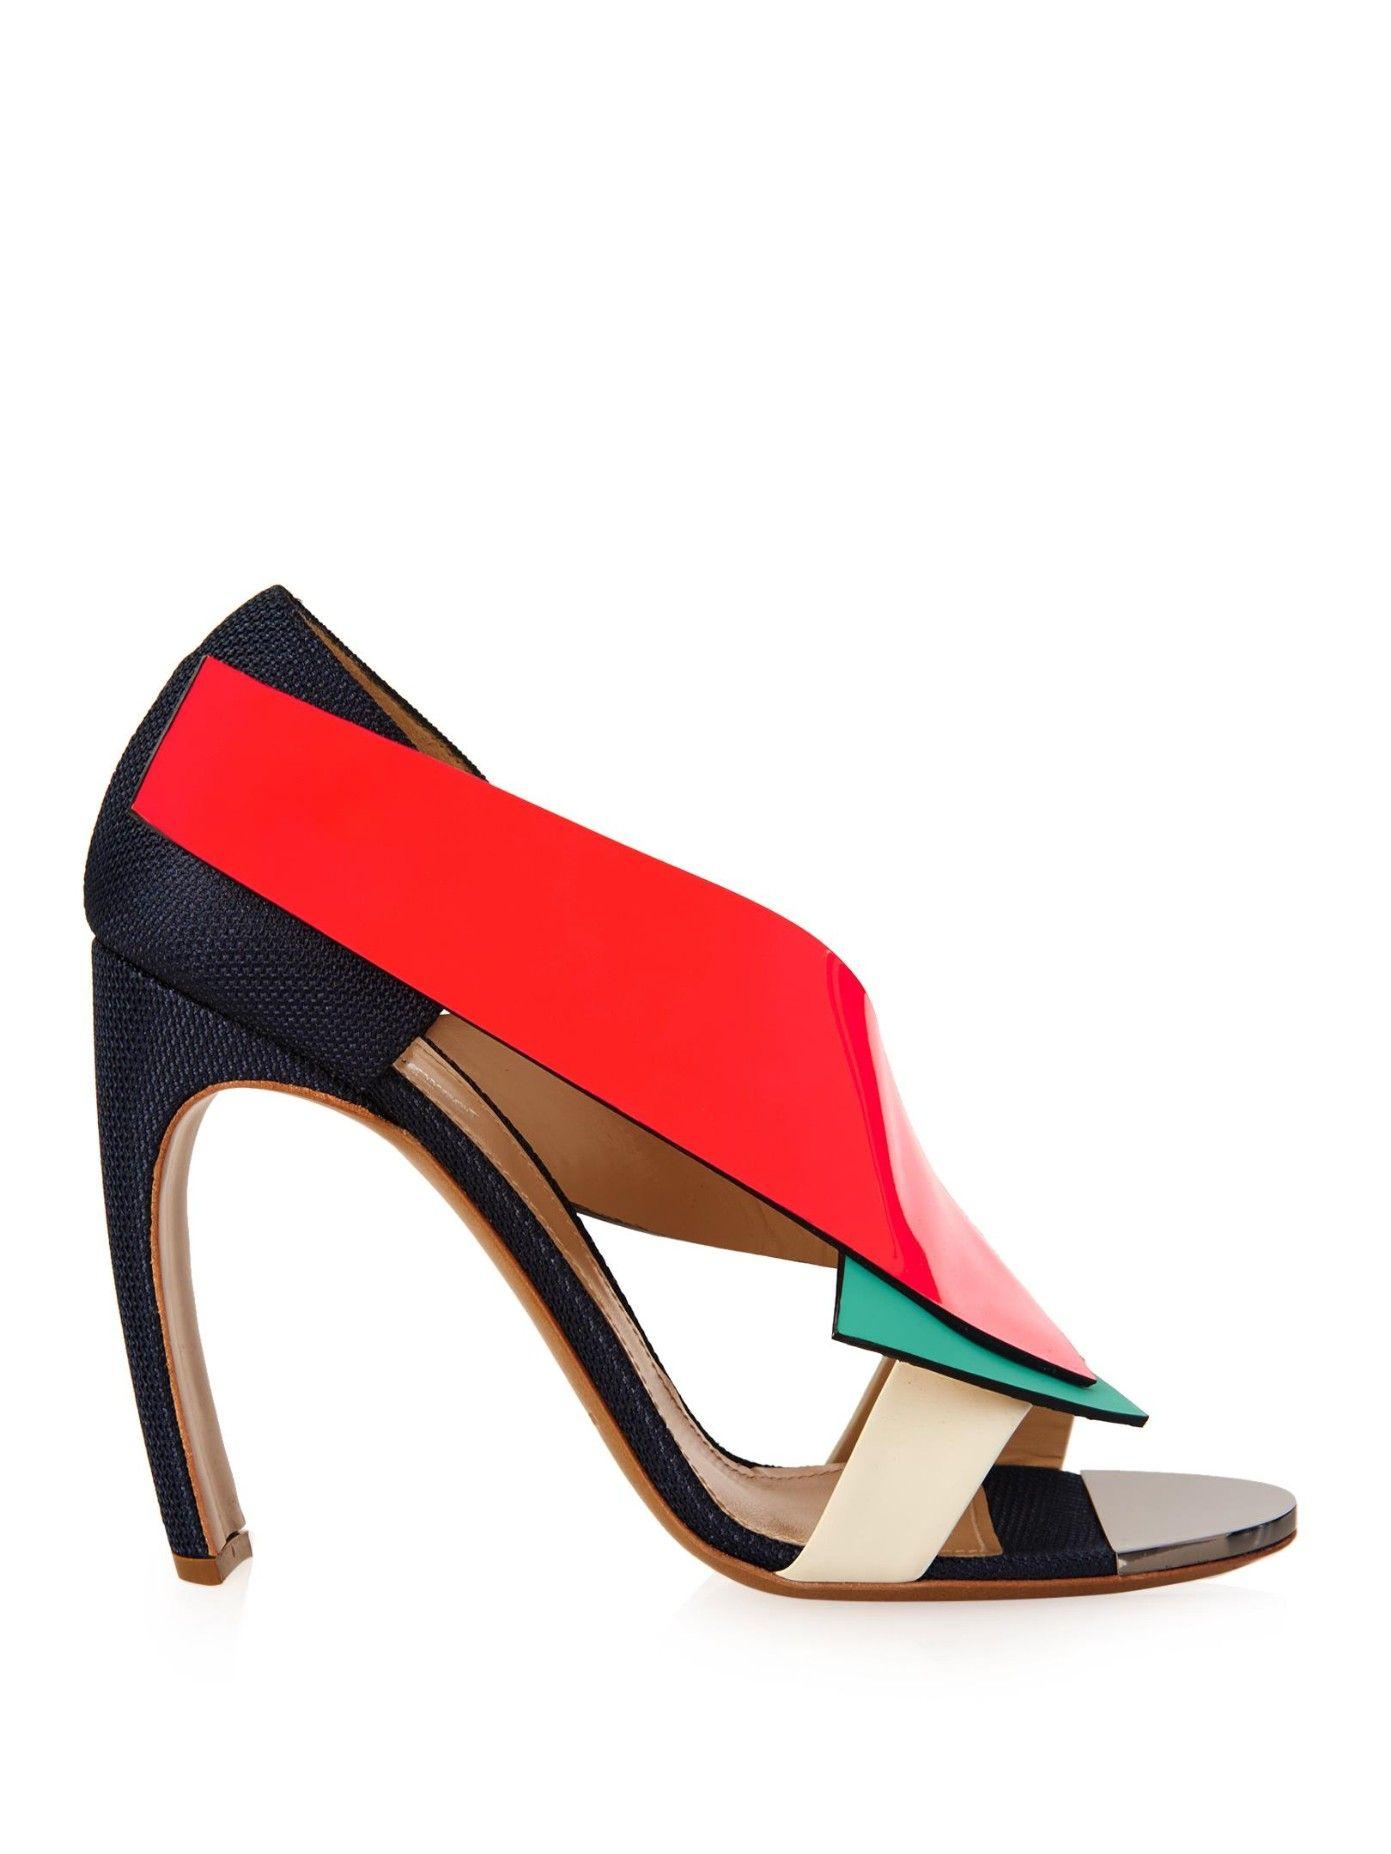 Nicholas Kirkwood Woman Leather-trimmed Python Platform Sandals Off-white Size 39 Nicholas Kirkwood WfLJlX3KFo